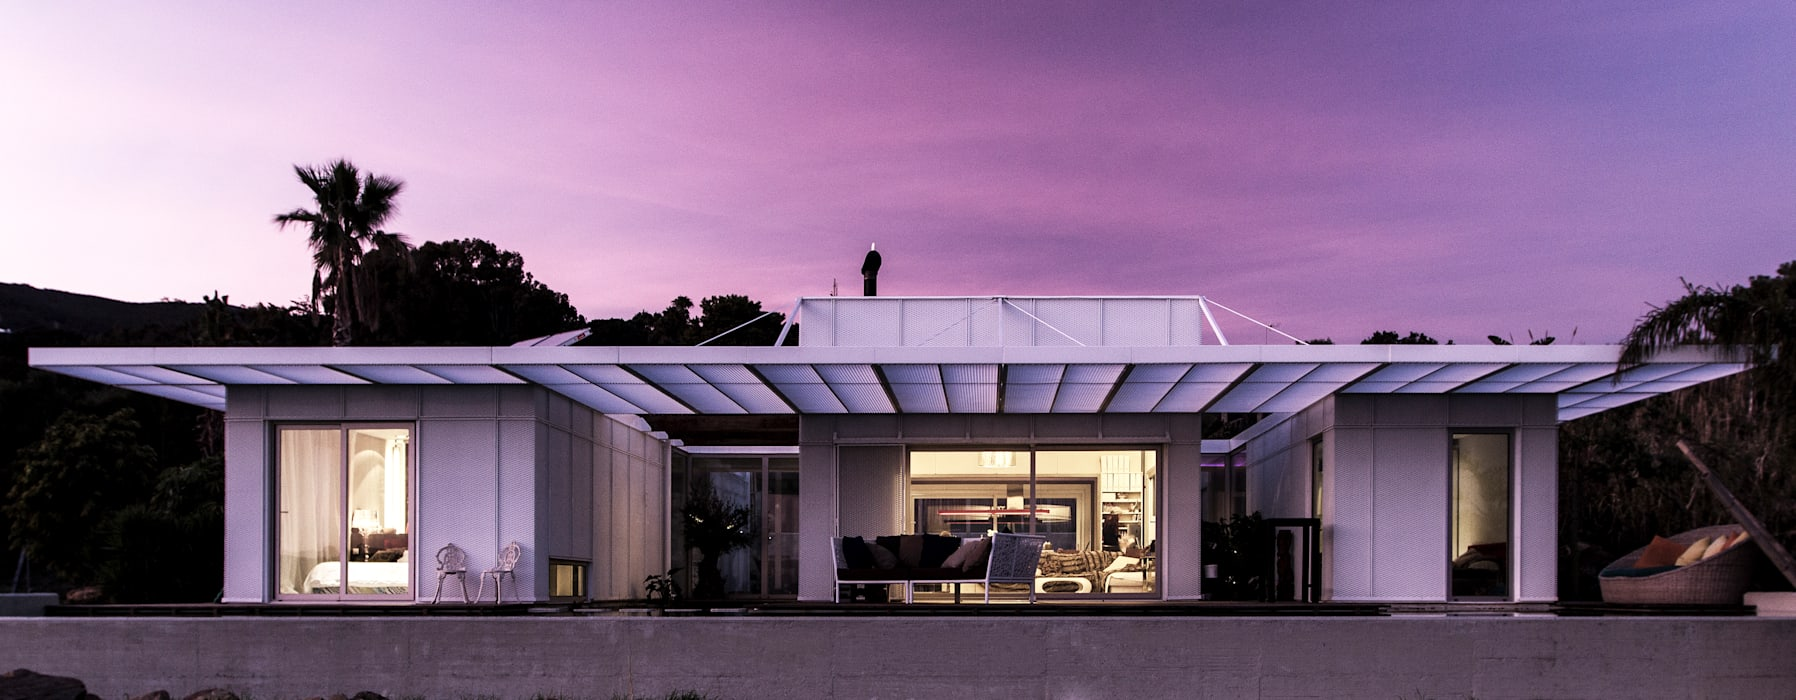 TARIFA HOUSE Casas modernas de james&mau Moderno Hierro/Acero